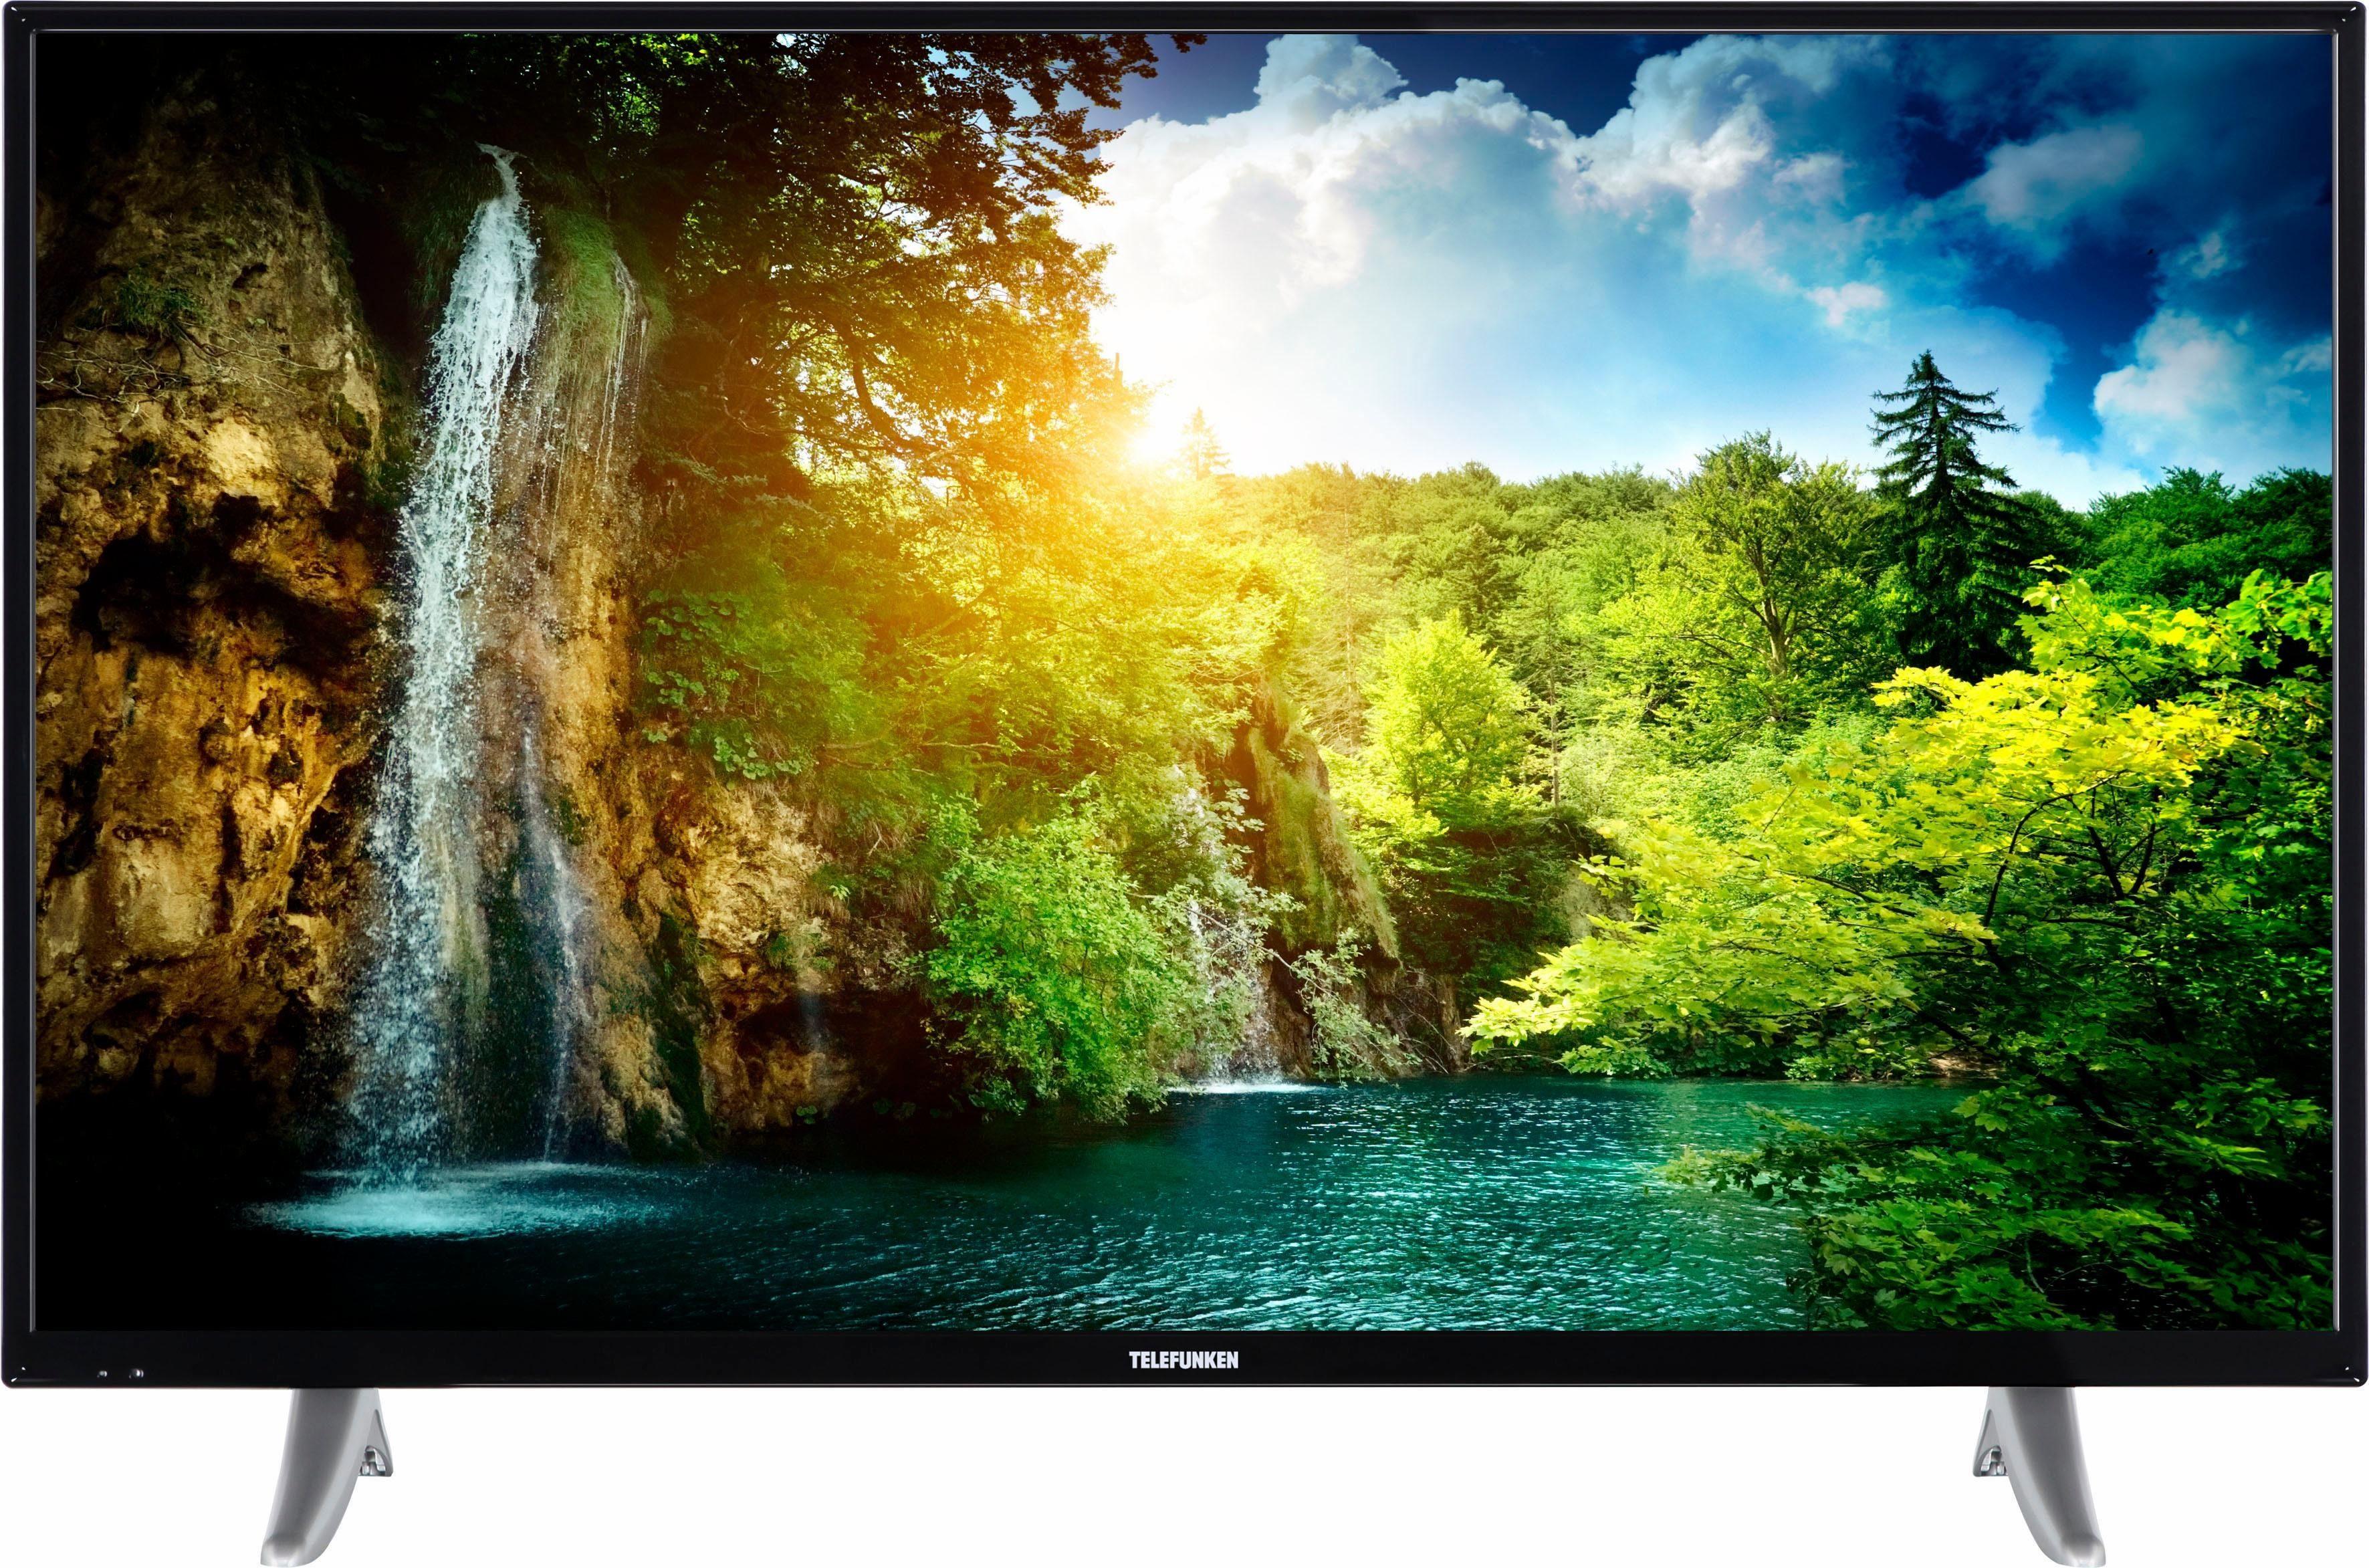 Telefunken D43F600M4CW LED-Fernseher (43 Zoll, Full HD, Smart-TV)